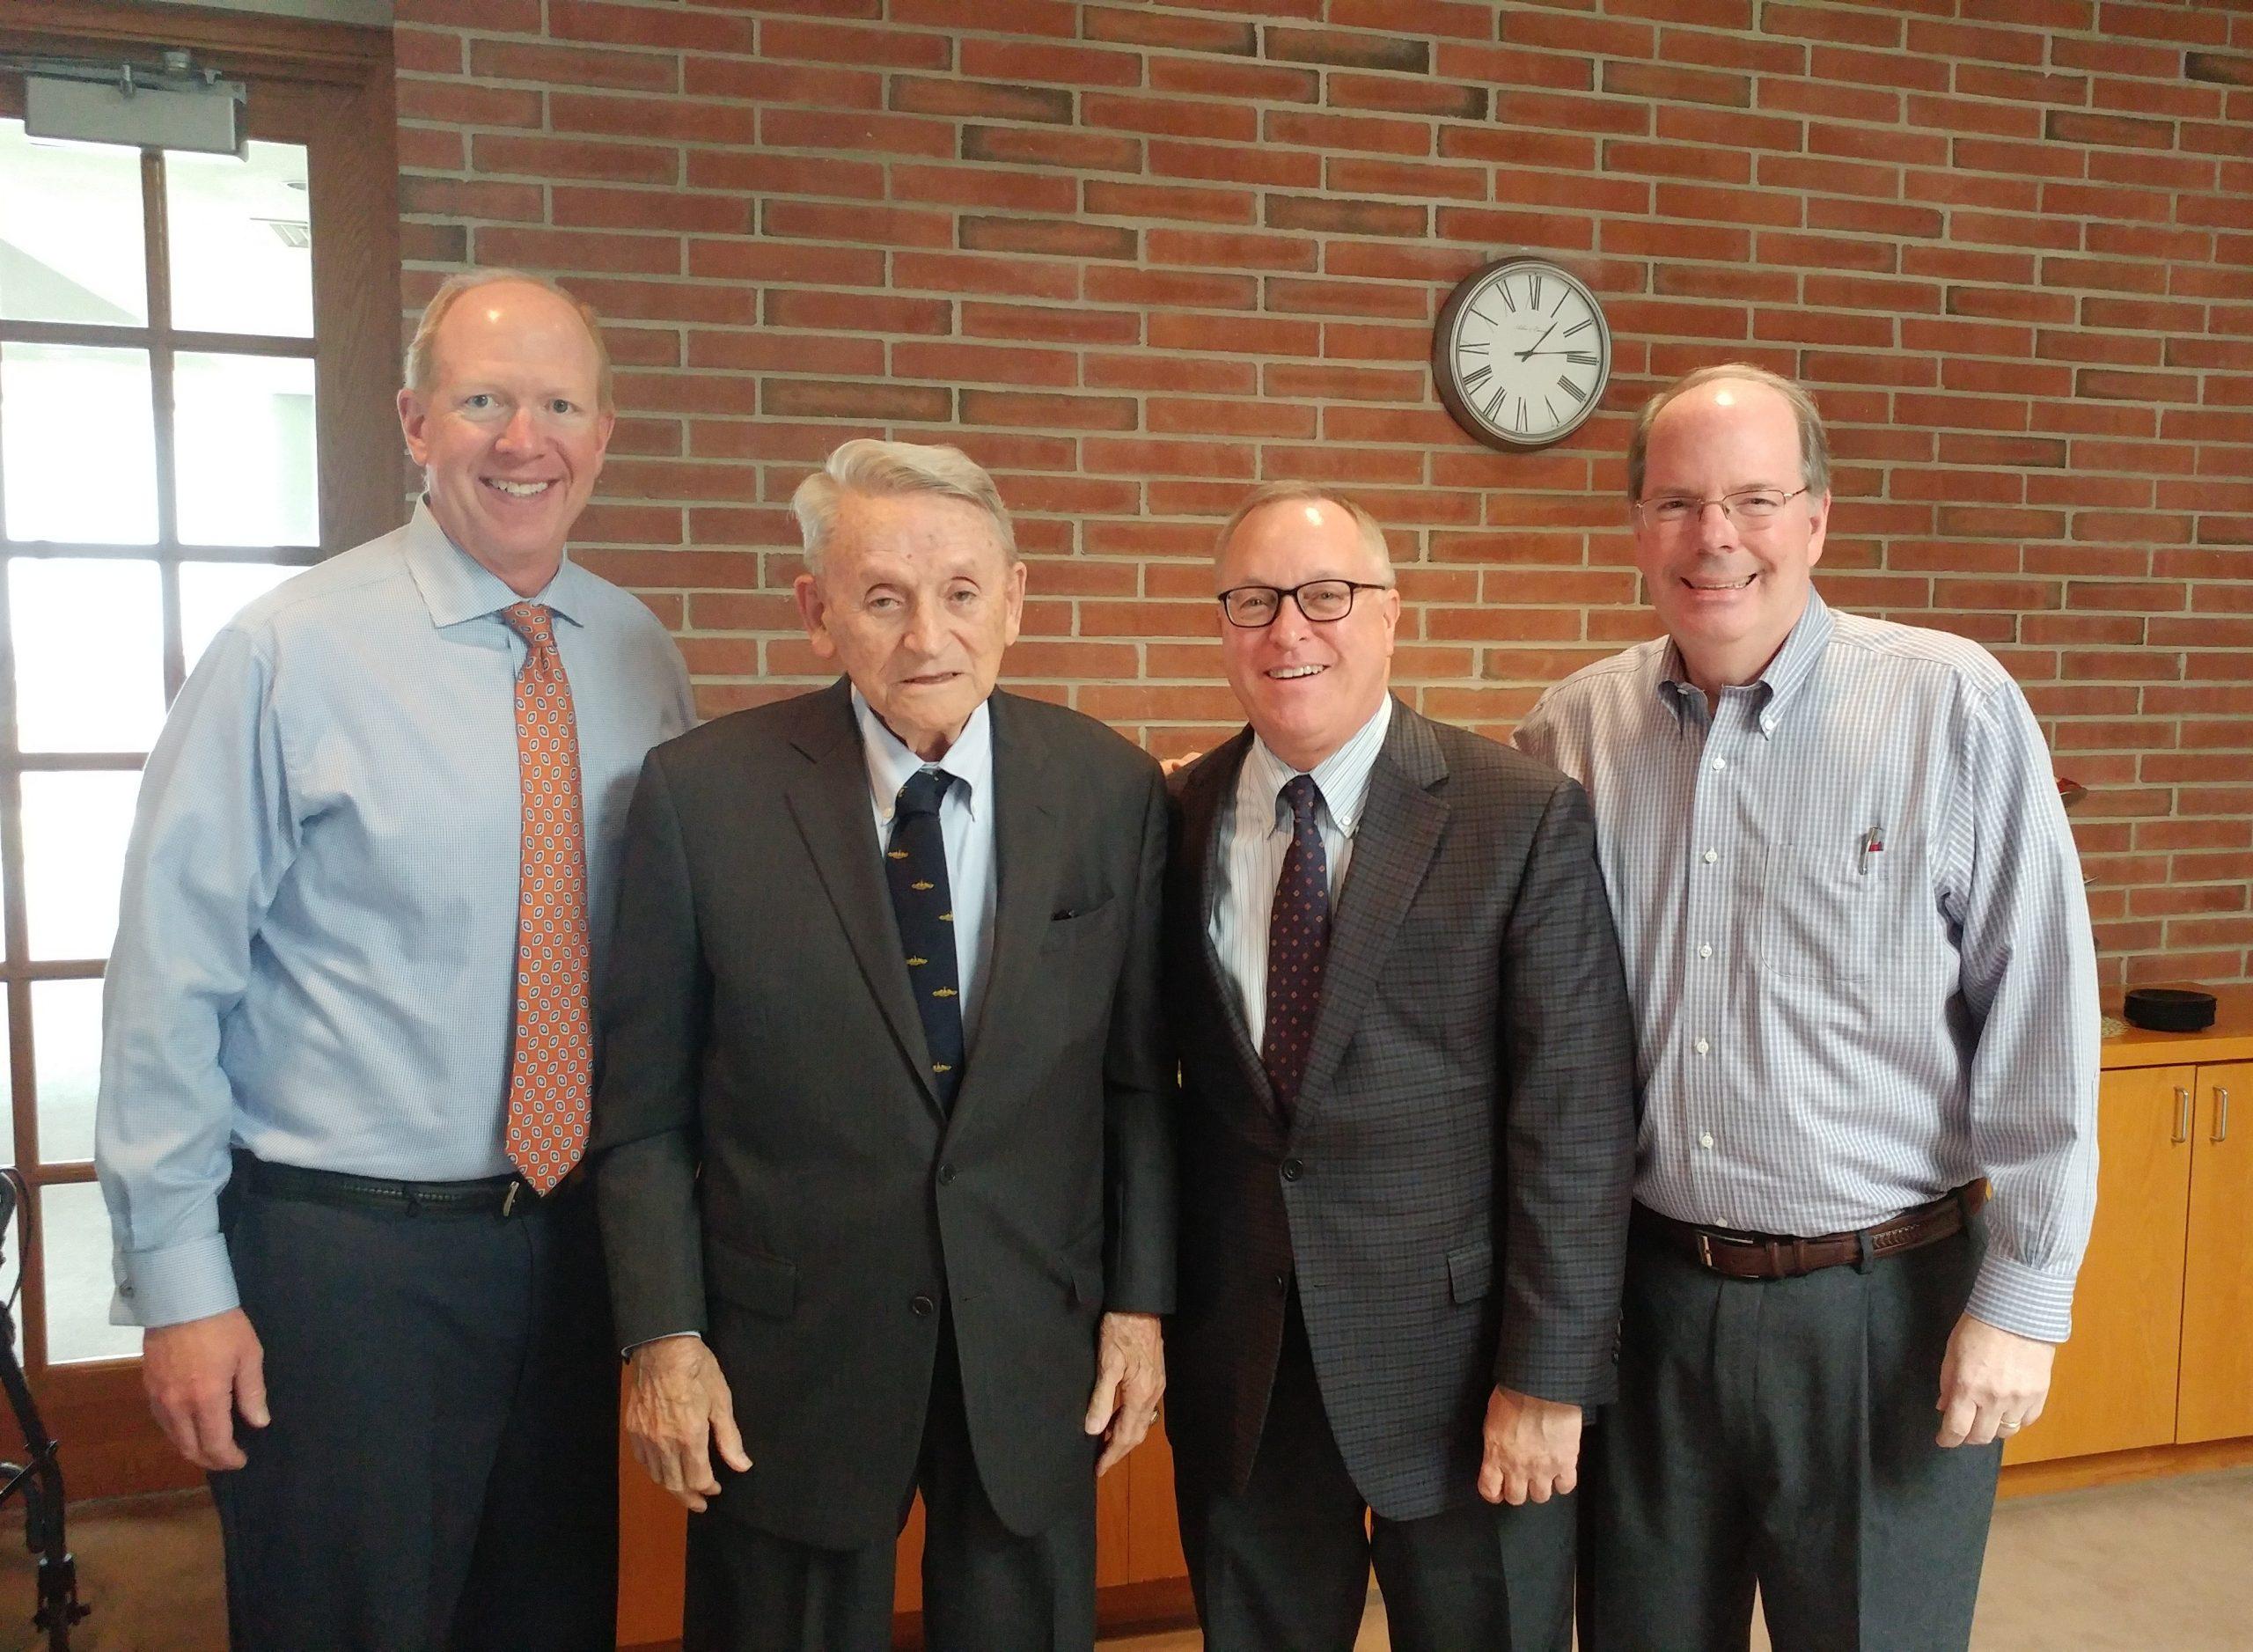 Benedictine announces retirement of Board member Adm. Al Burkhalter